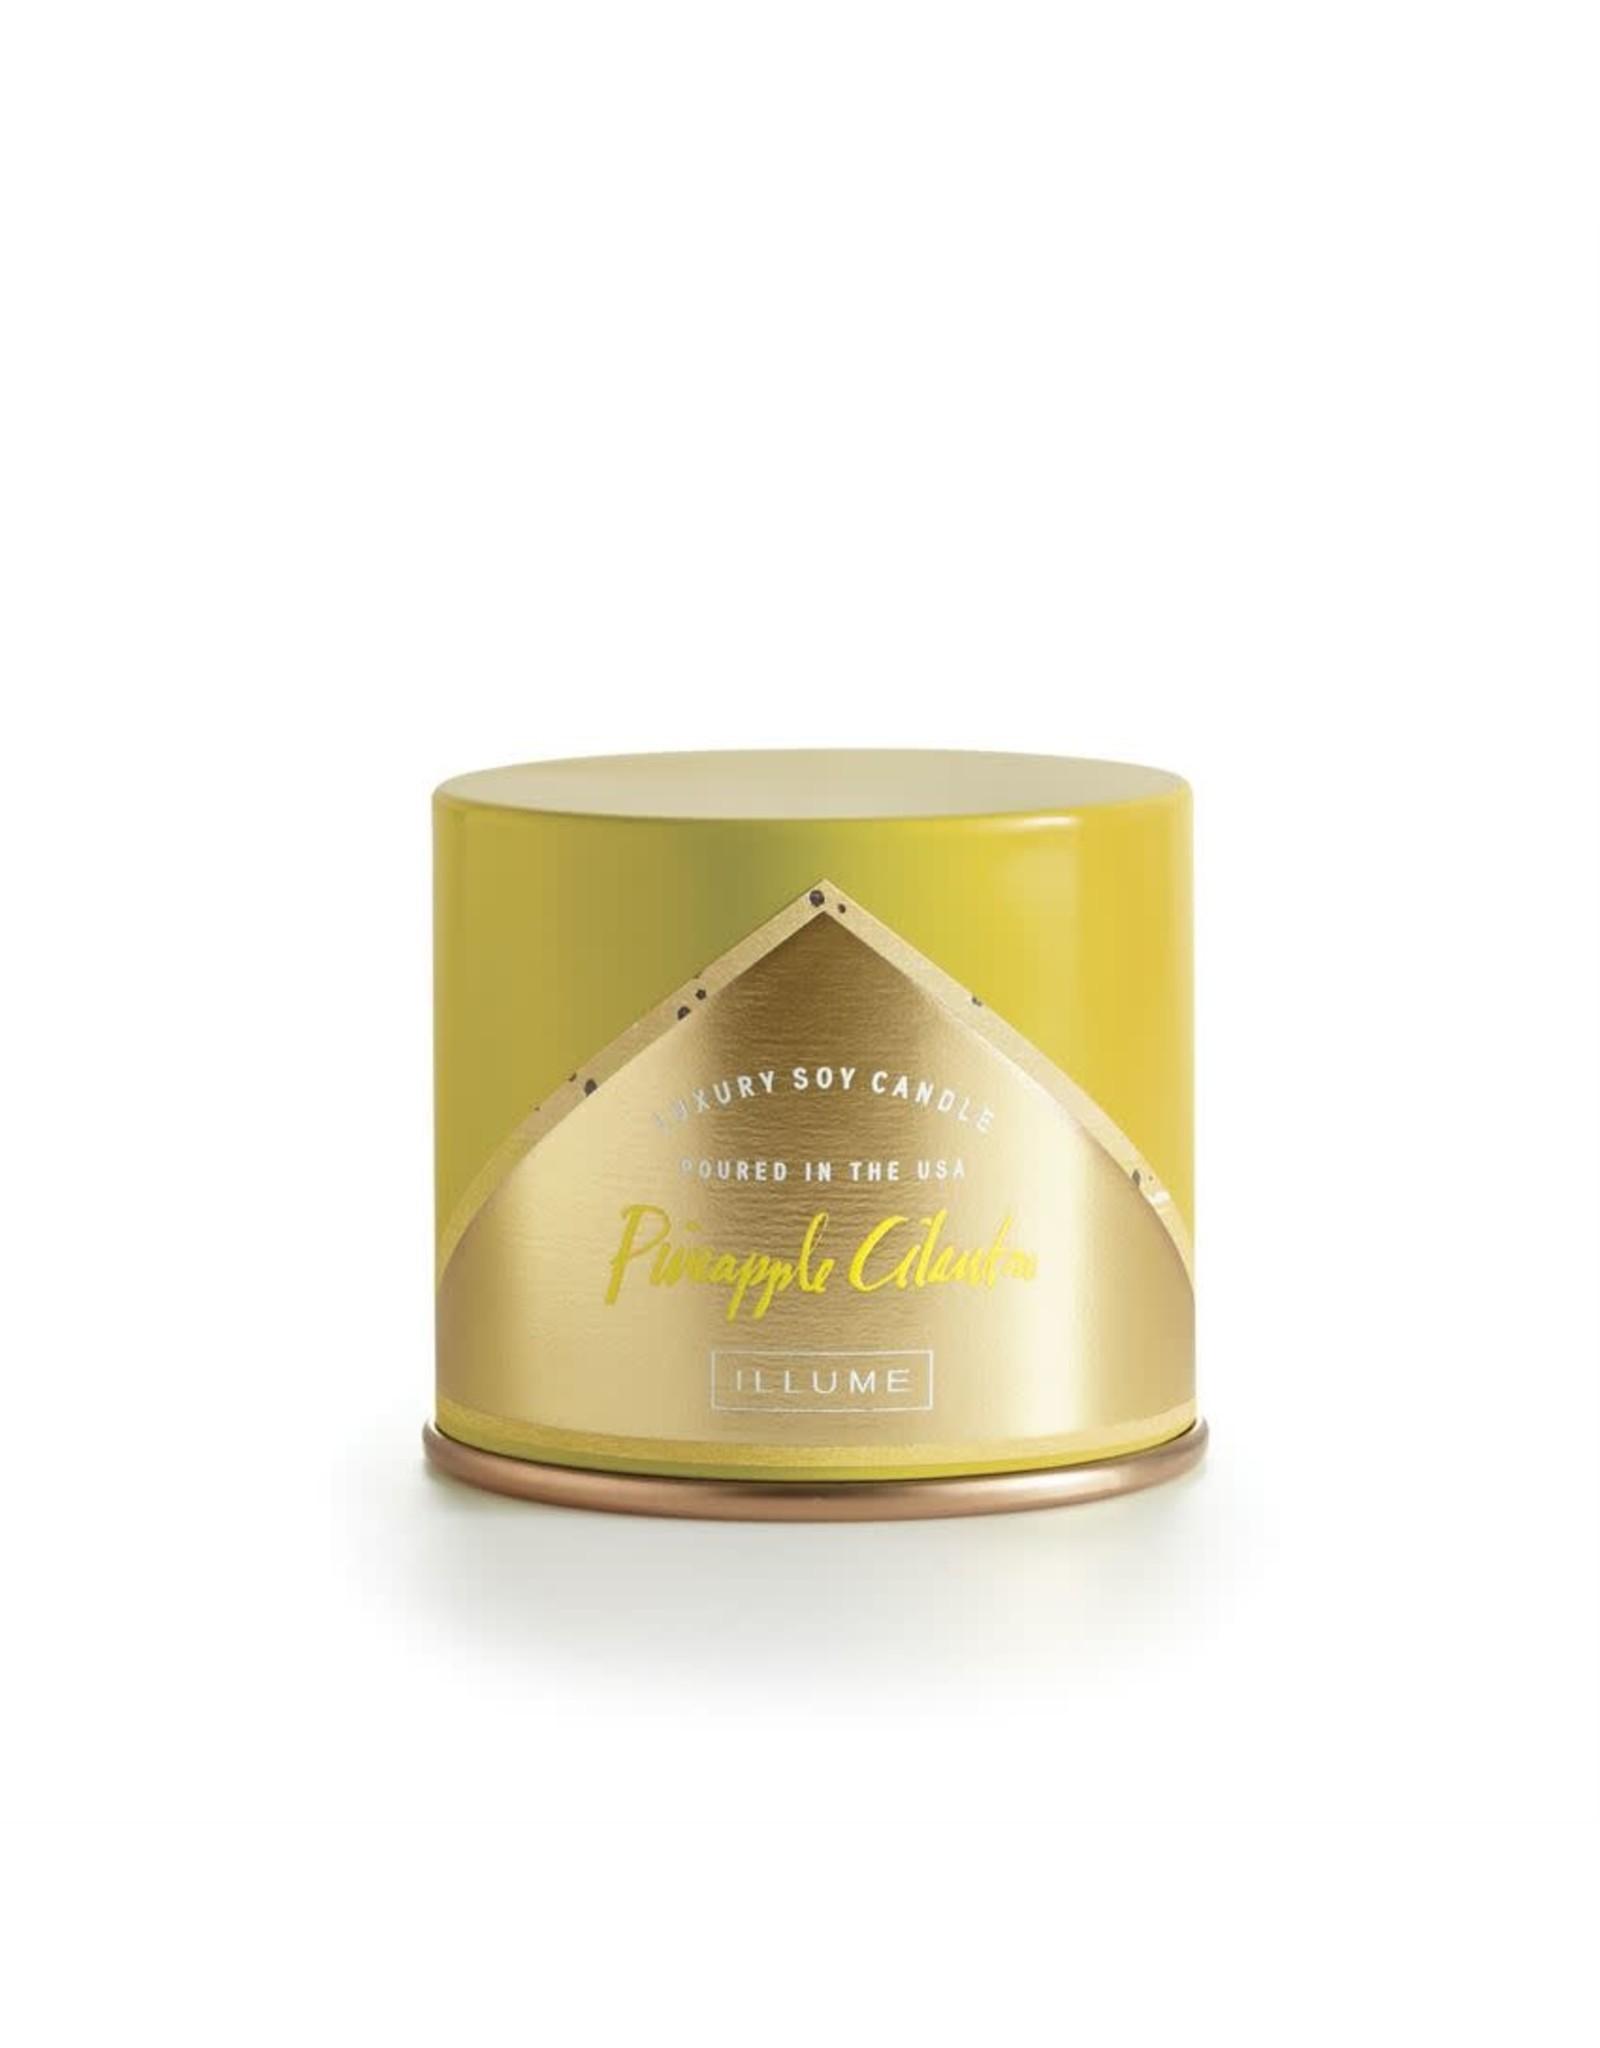 Pineapple Cilantro - Large Tin Candle